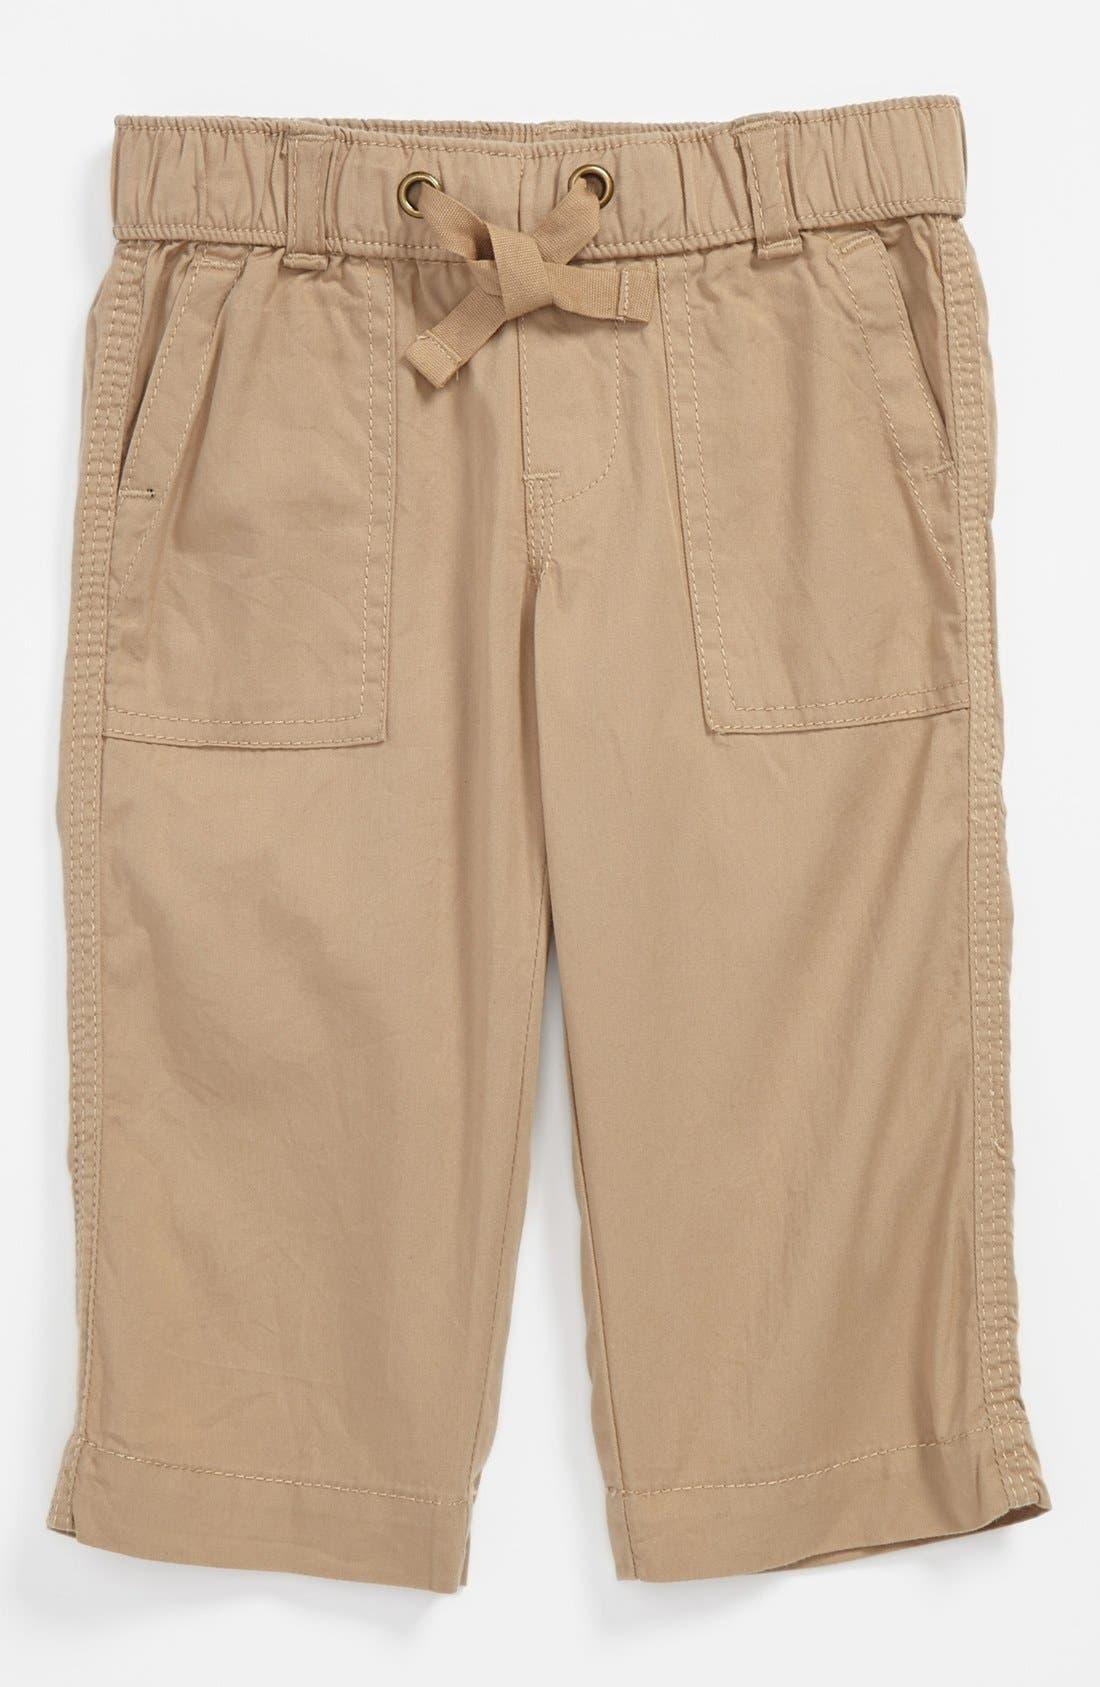 Alternate Image 1 Selected - Peek 'Tilden' Utility Pants (Baby Boys)